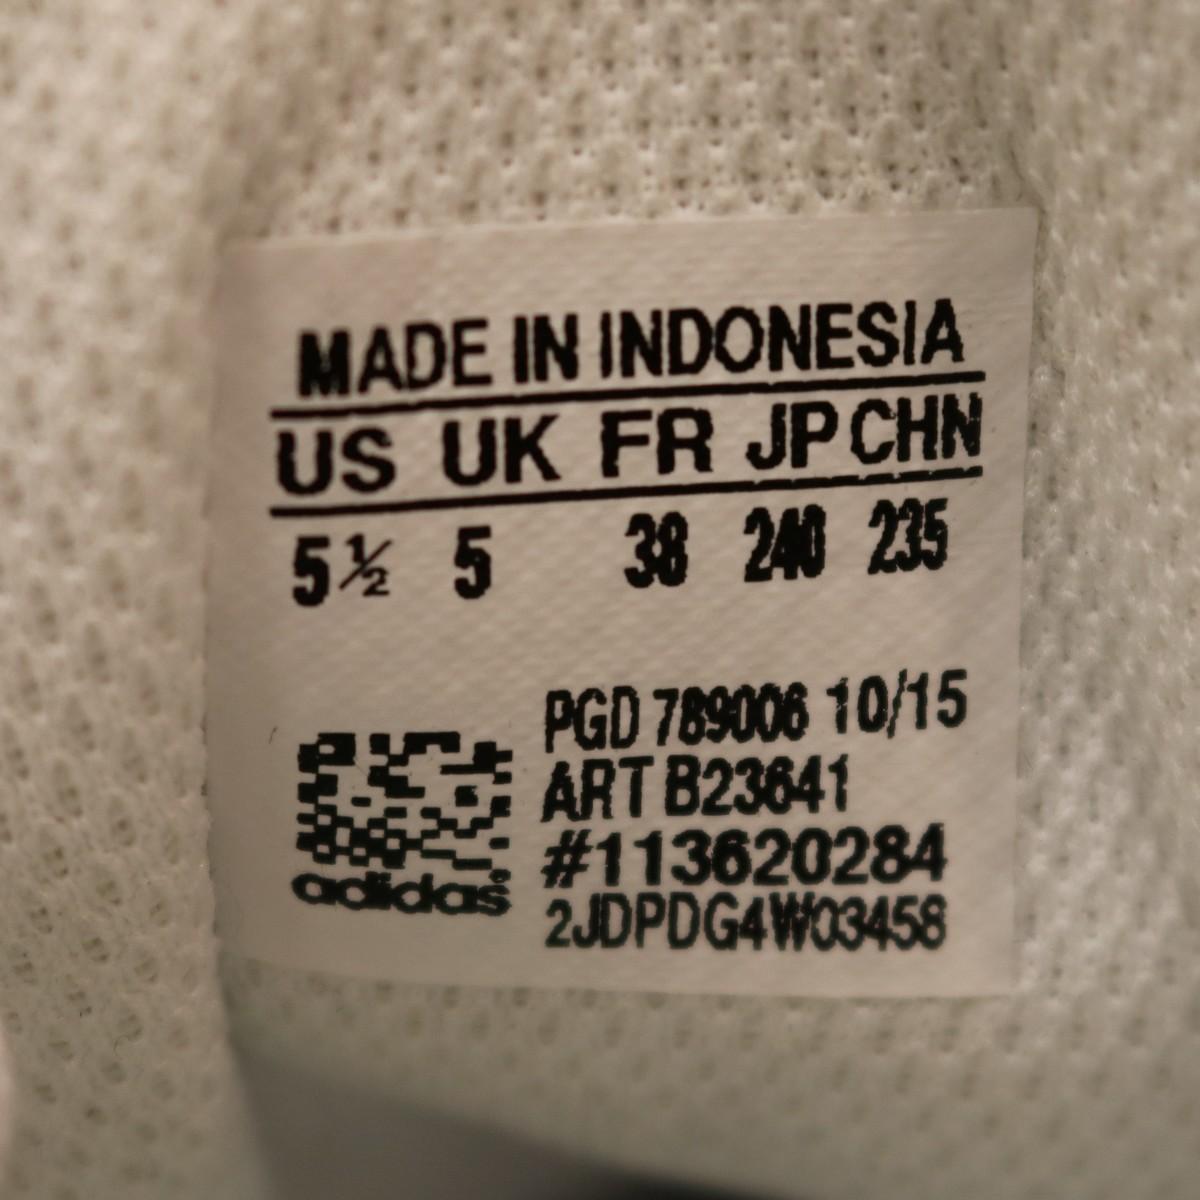 metka-adidas-made-in-indonesia-jak-wyglada